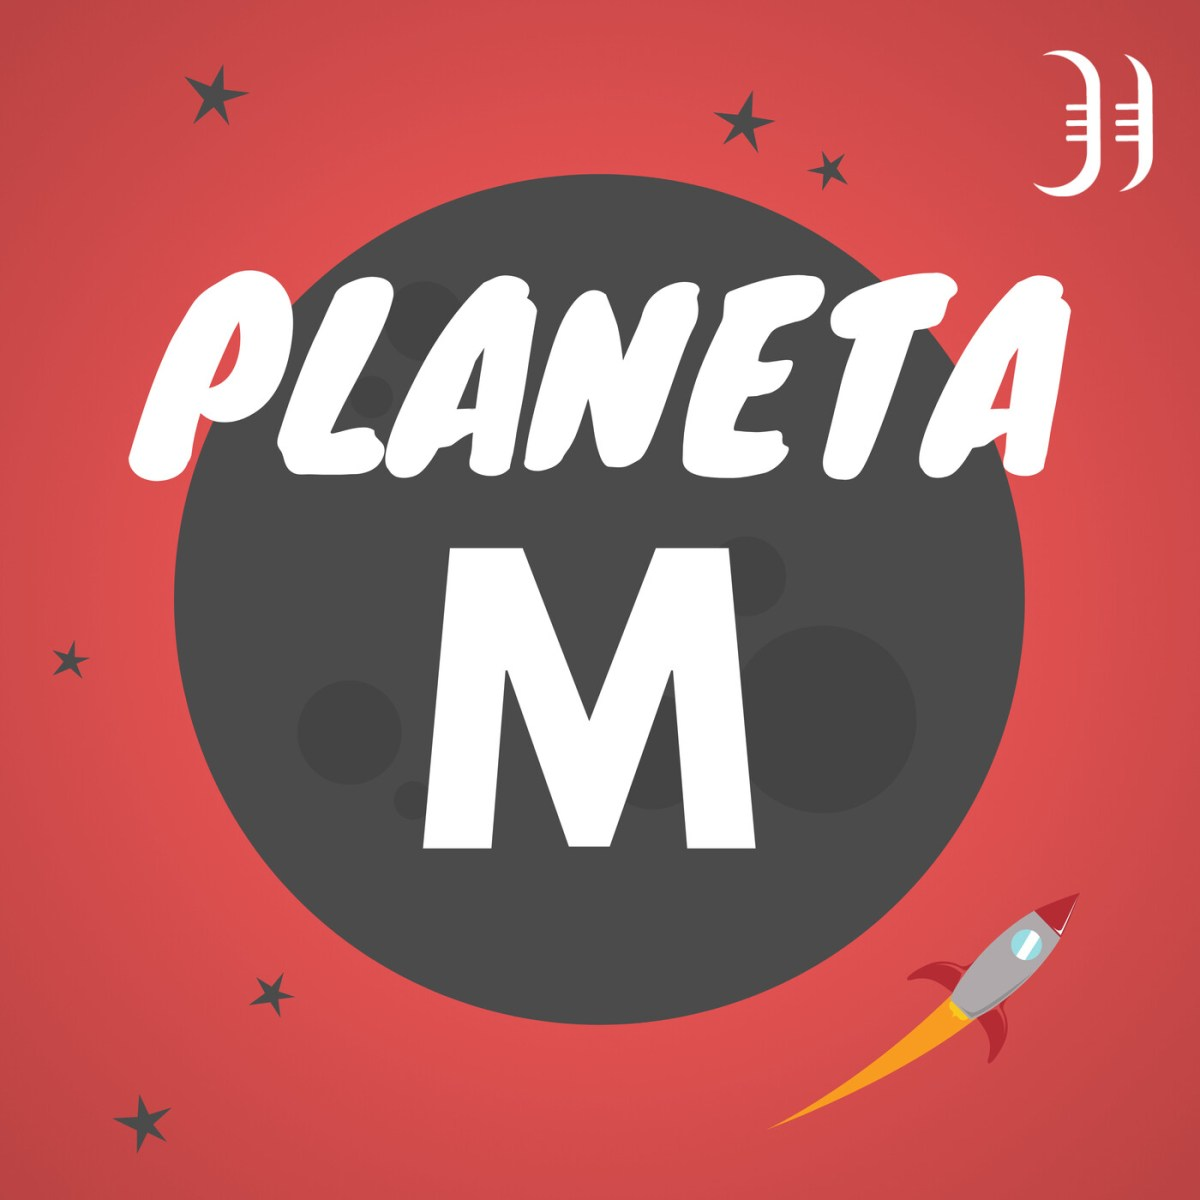 Planeta M - Tertulia de marketing digital